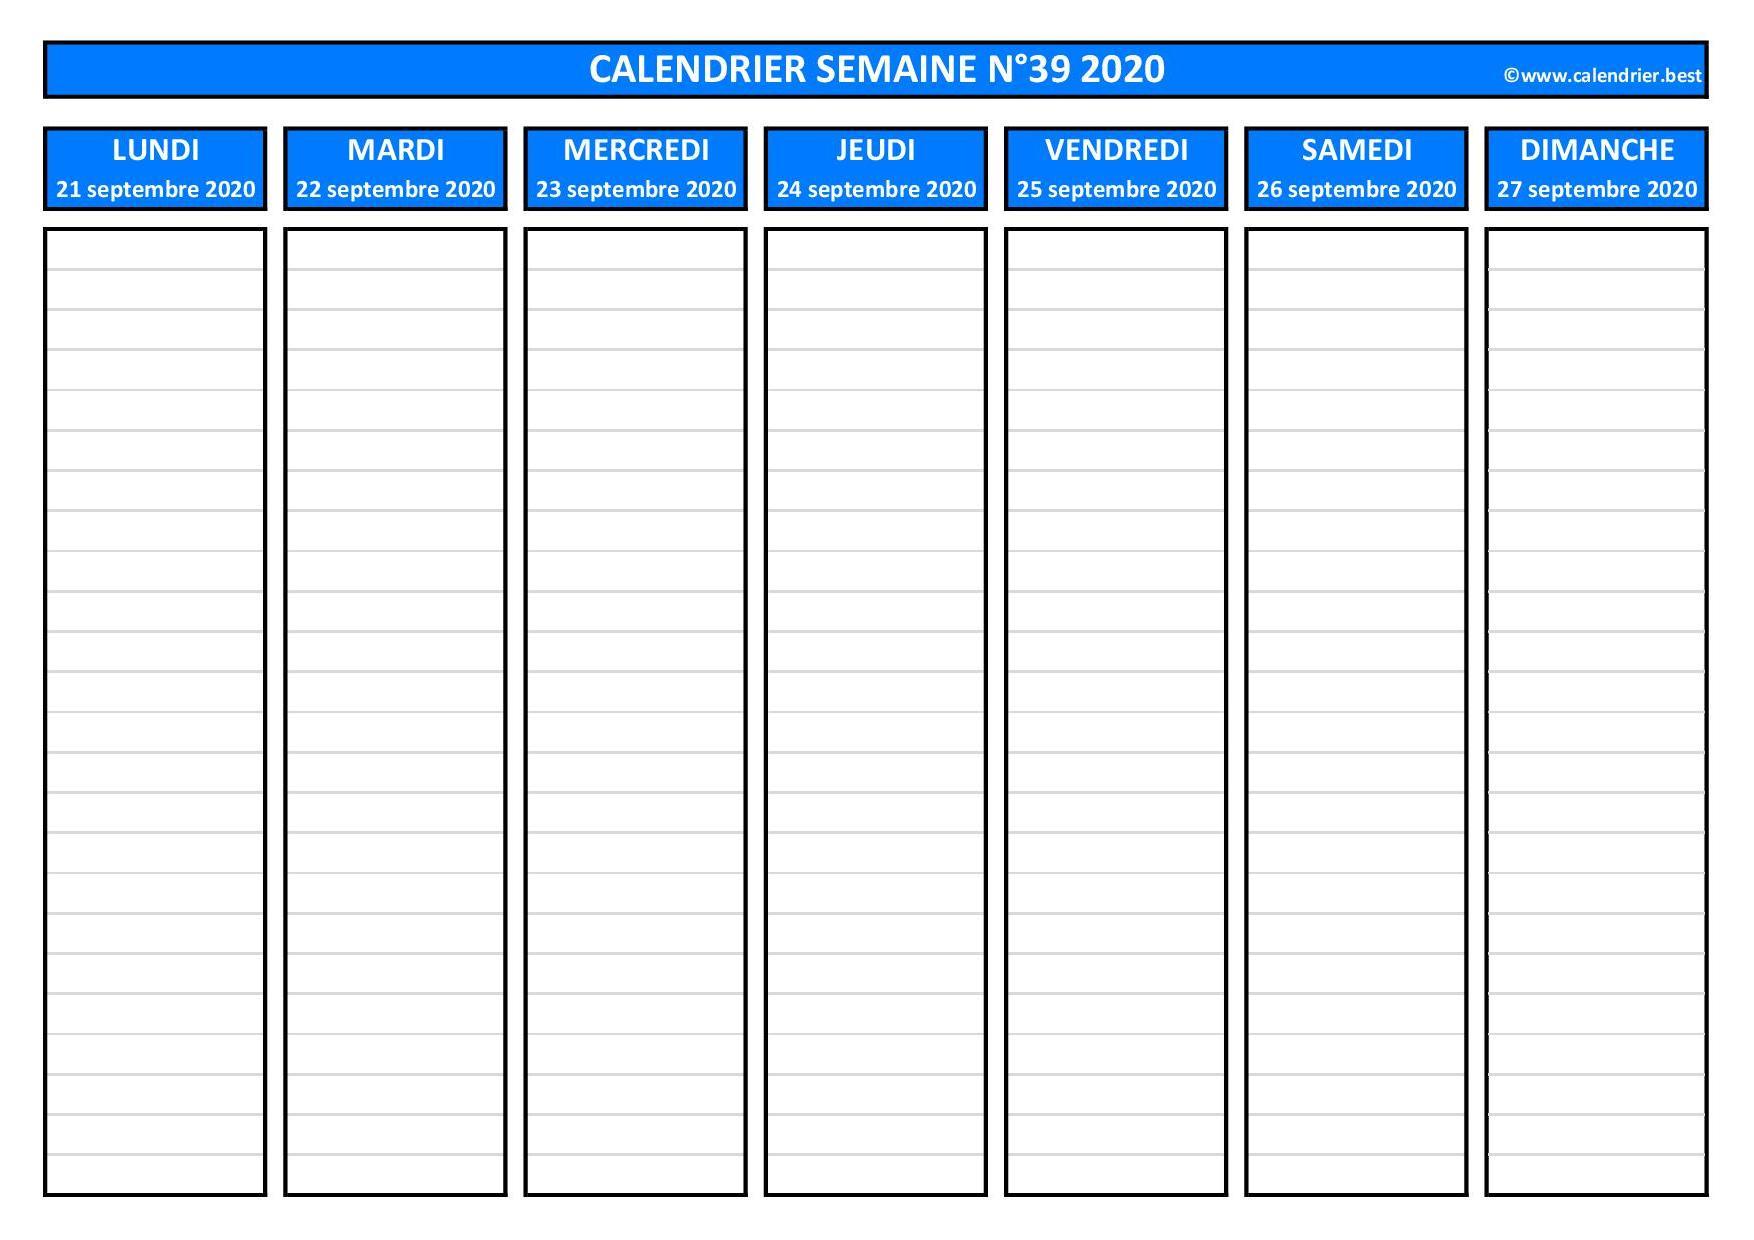 Semaine 39 2020 : dates, calendrier et planning  Calendrier.best